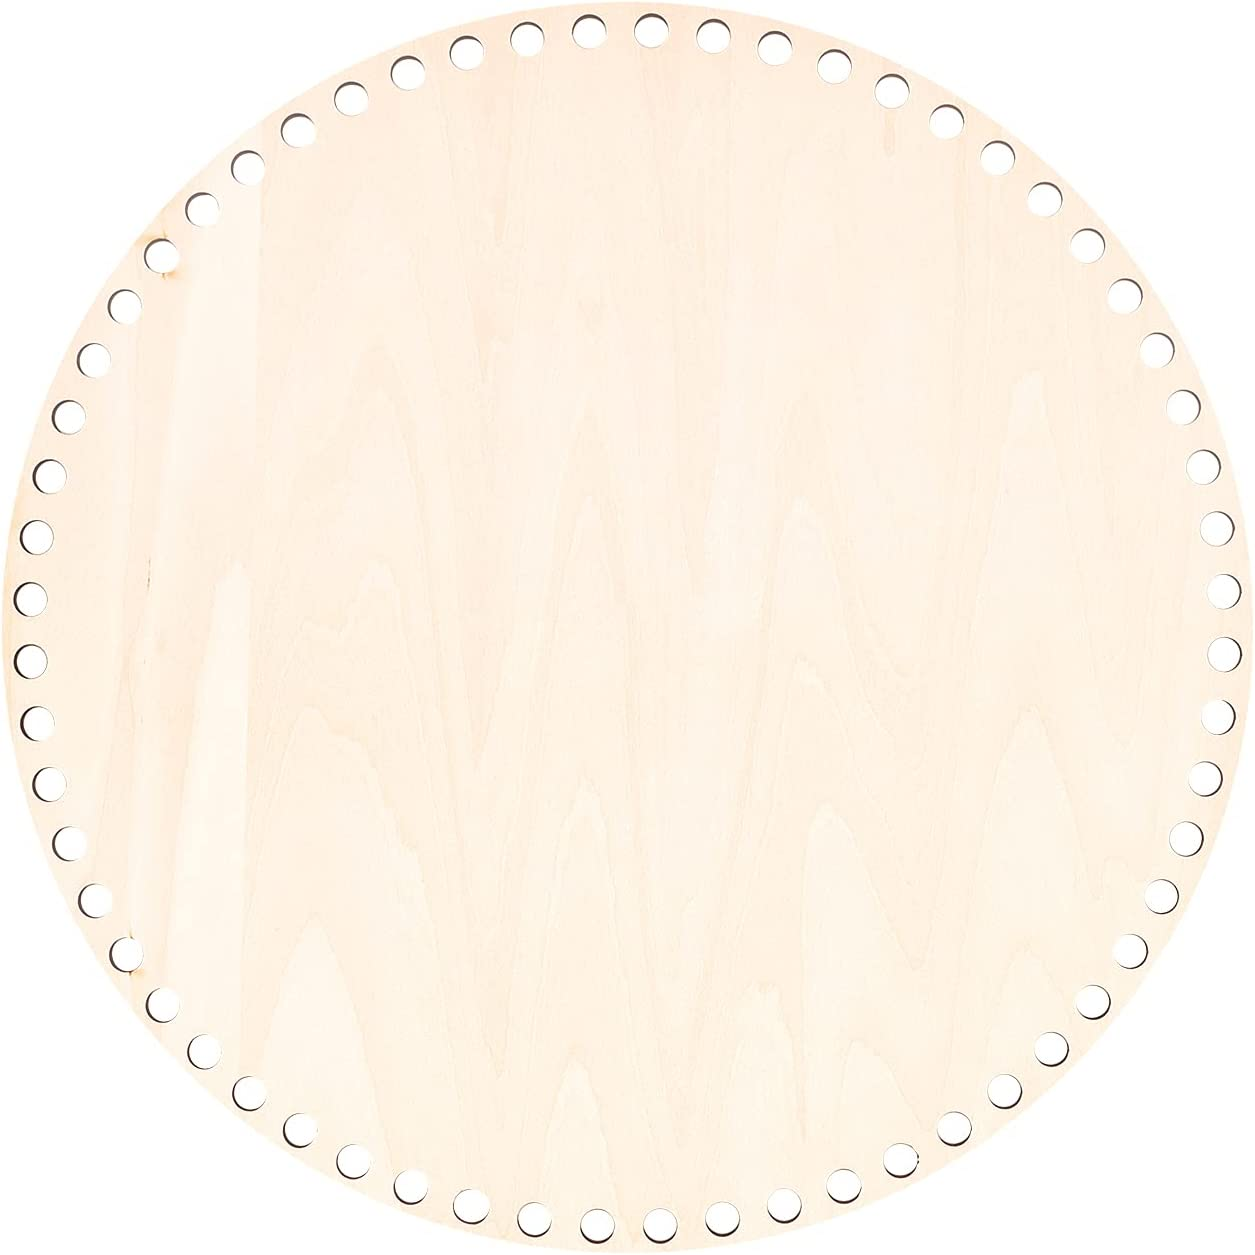 PH PandaHall 30cm Natural Ranking TOP3 Wooden Alternative dealer Hole with Basket Bottom Circle